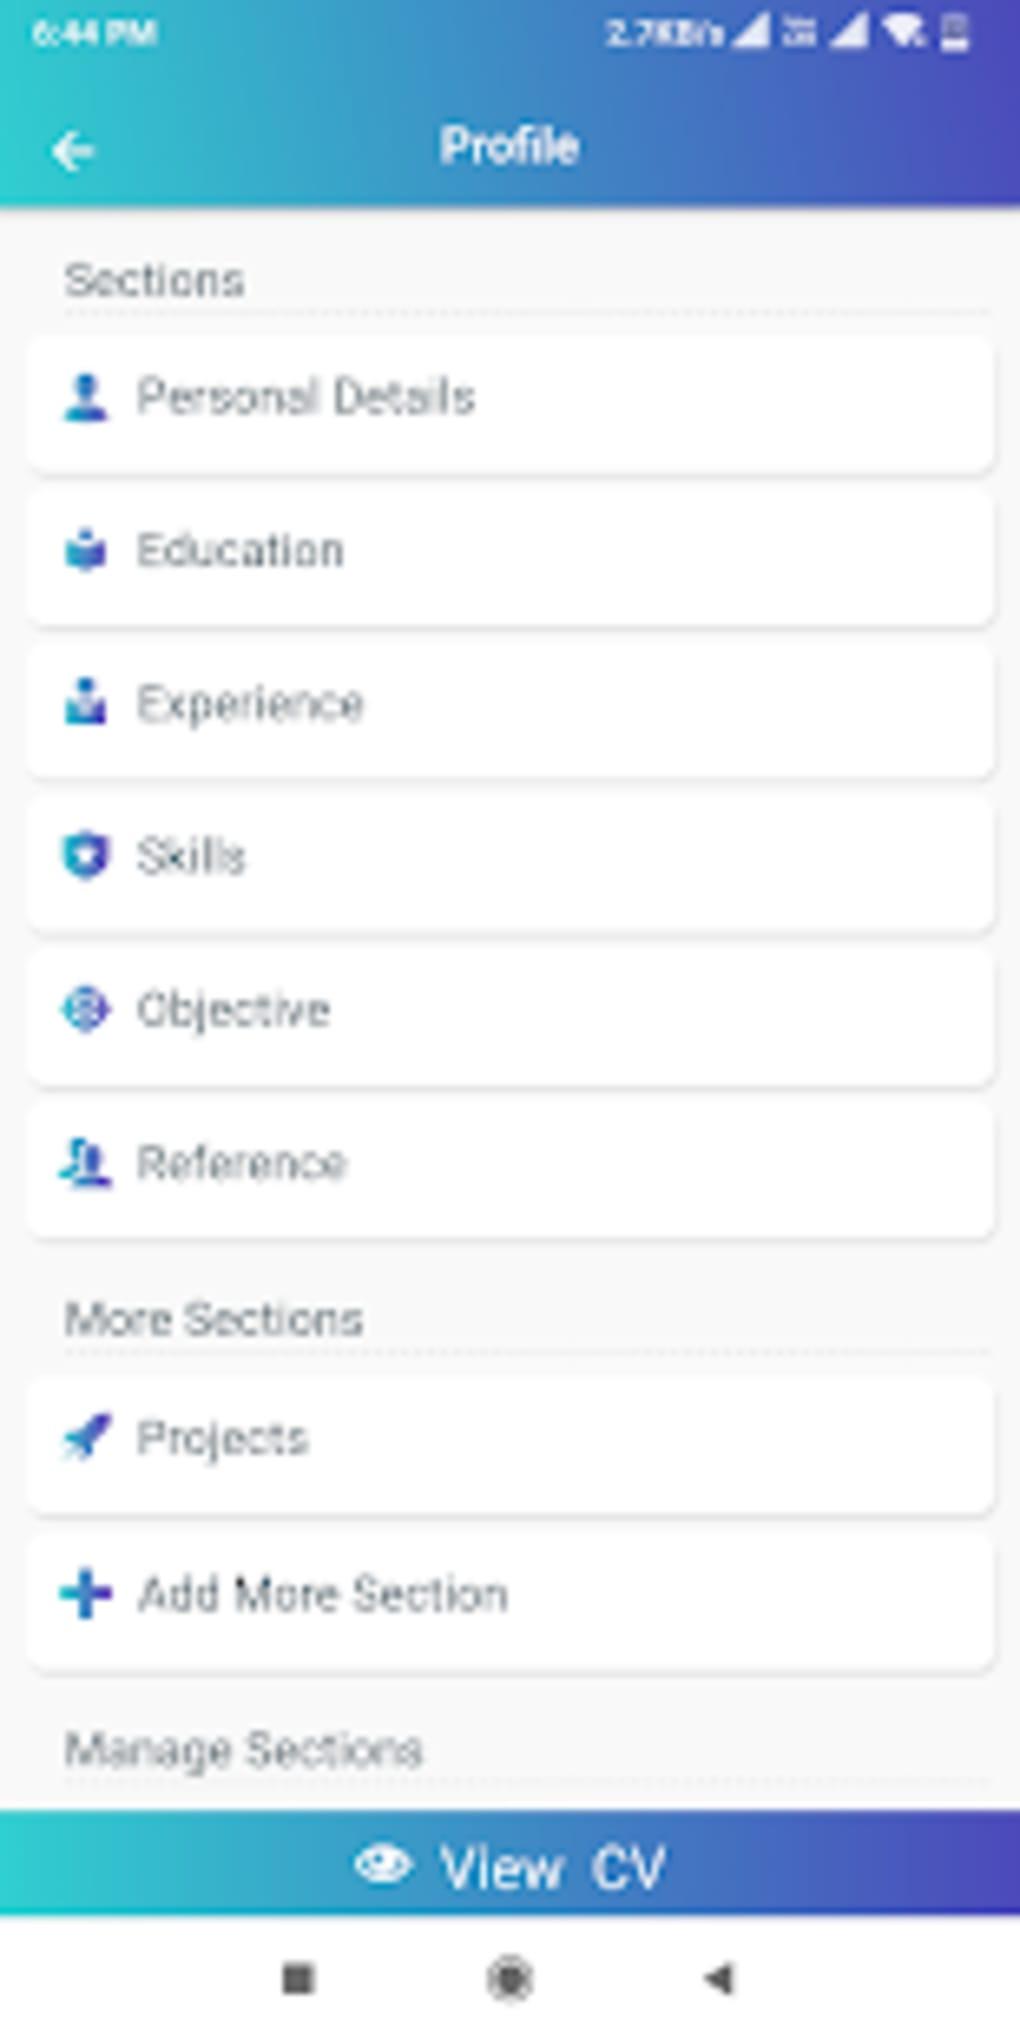 resume builder app free cv maker cv templates 2019  u0644 u0646 u0638 u0627 u0645